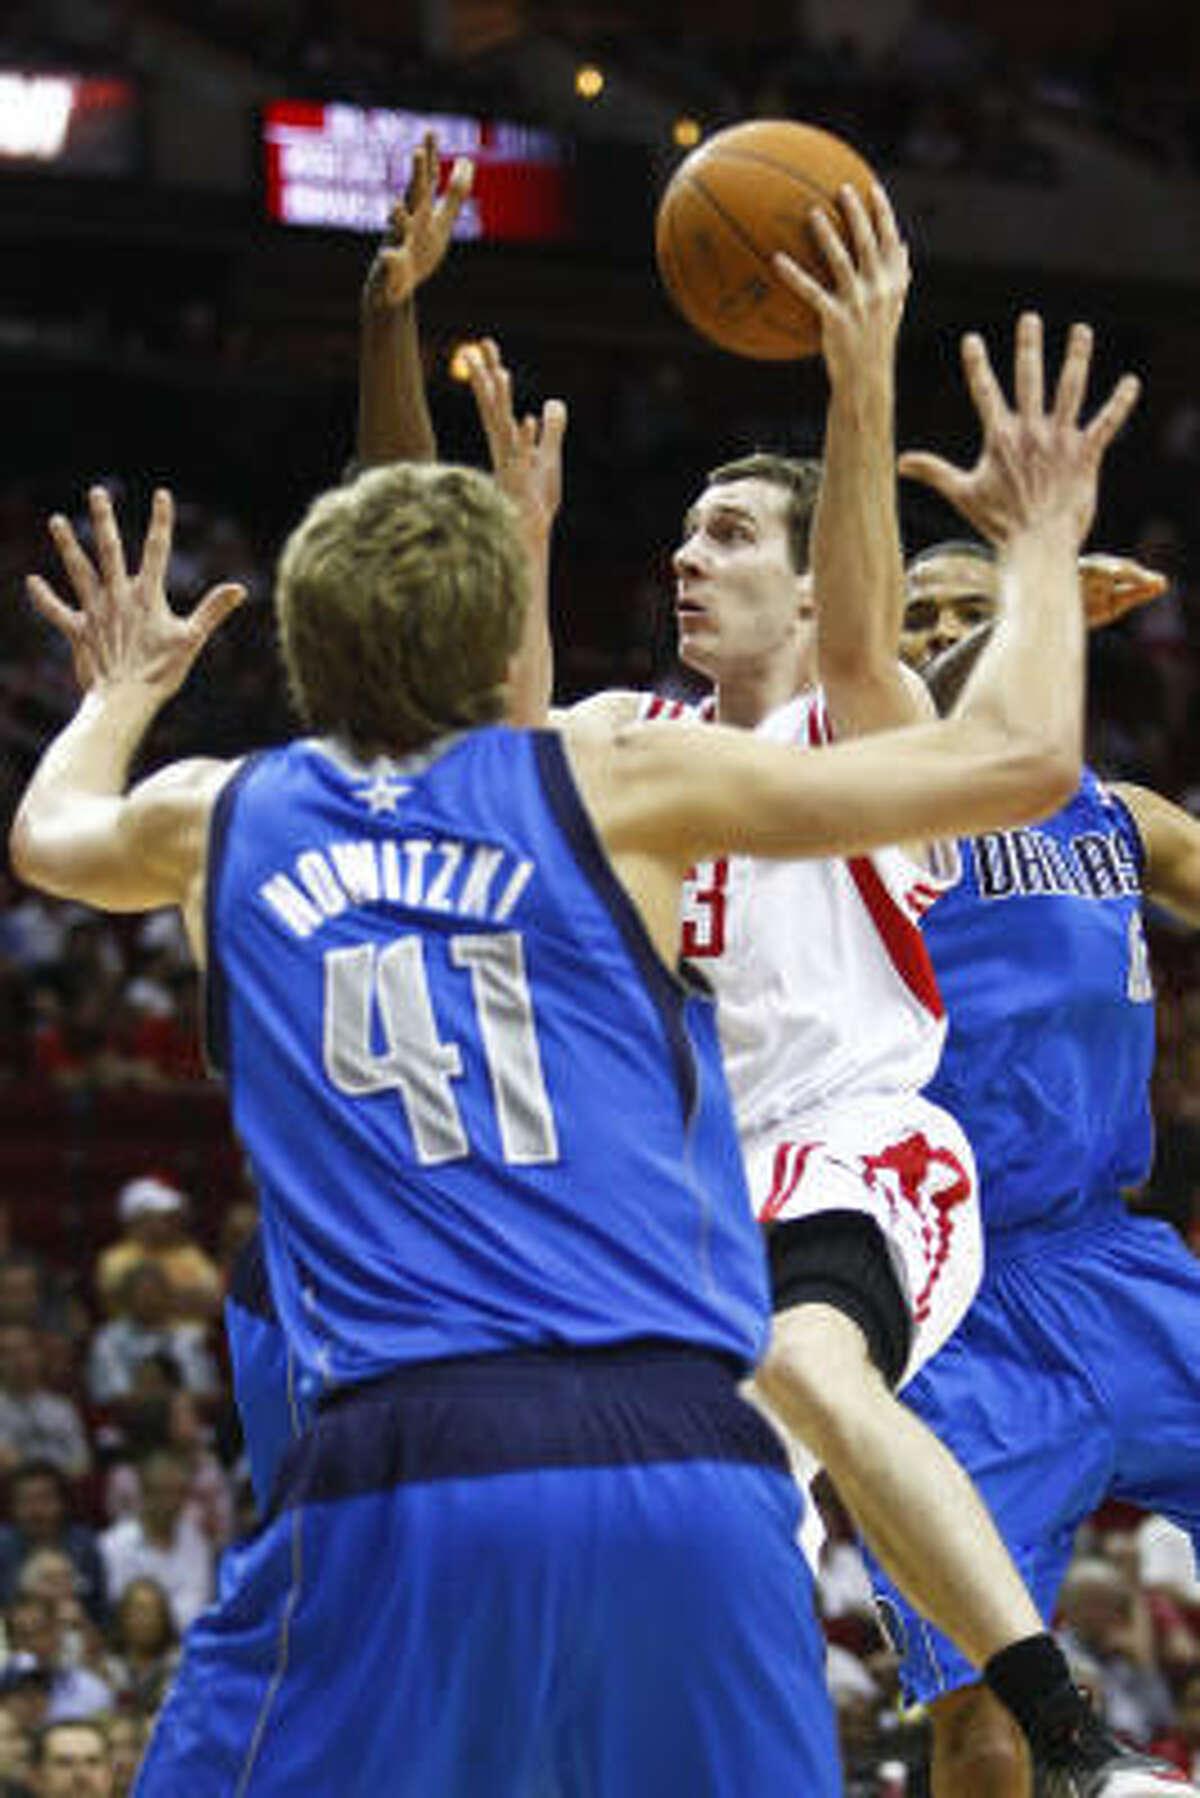 Rockets point guard Goran Dragic (3) goes up for a shot against Dallas Mavericks power forward Dirk Nowitzki (41).